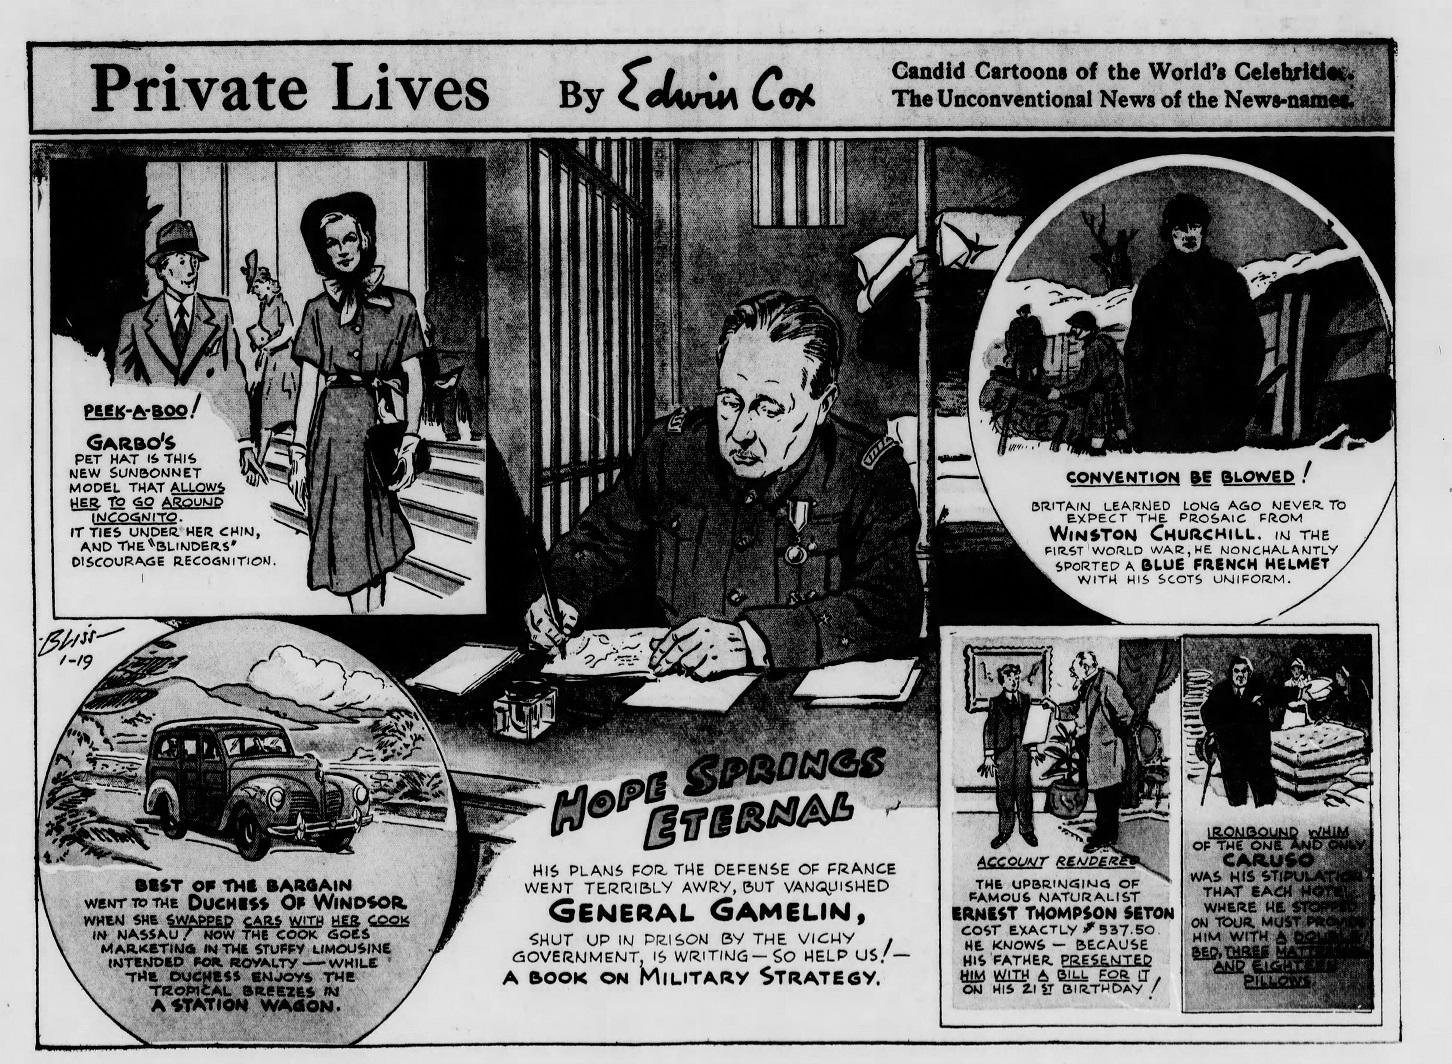 The_Brooklyn_Daily_Eagle_Sun__Jan_19__1941_(6).jpg